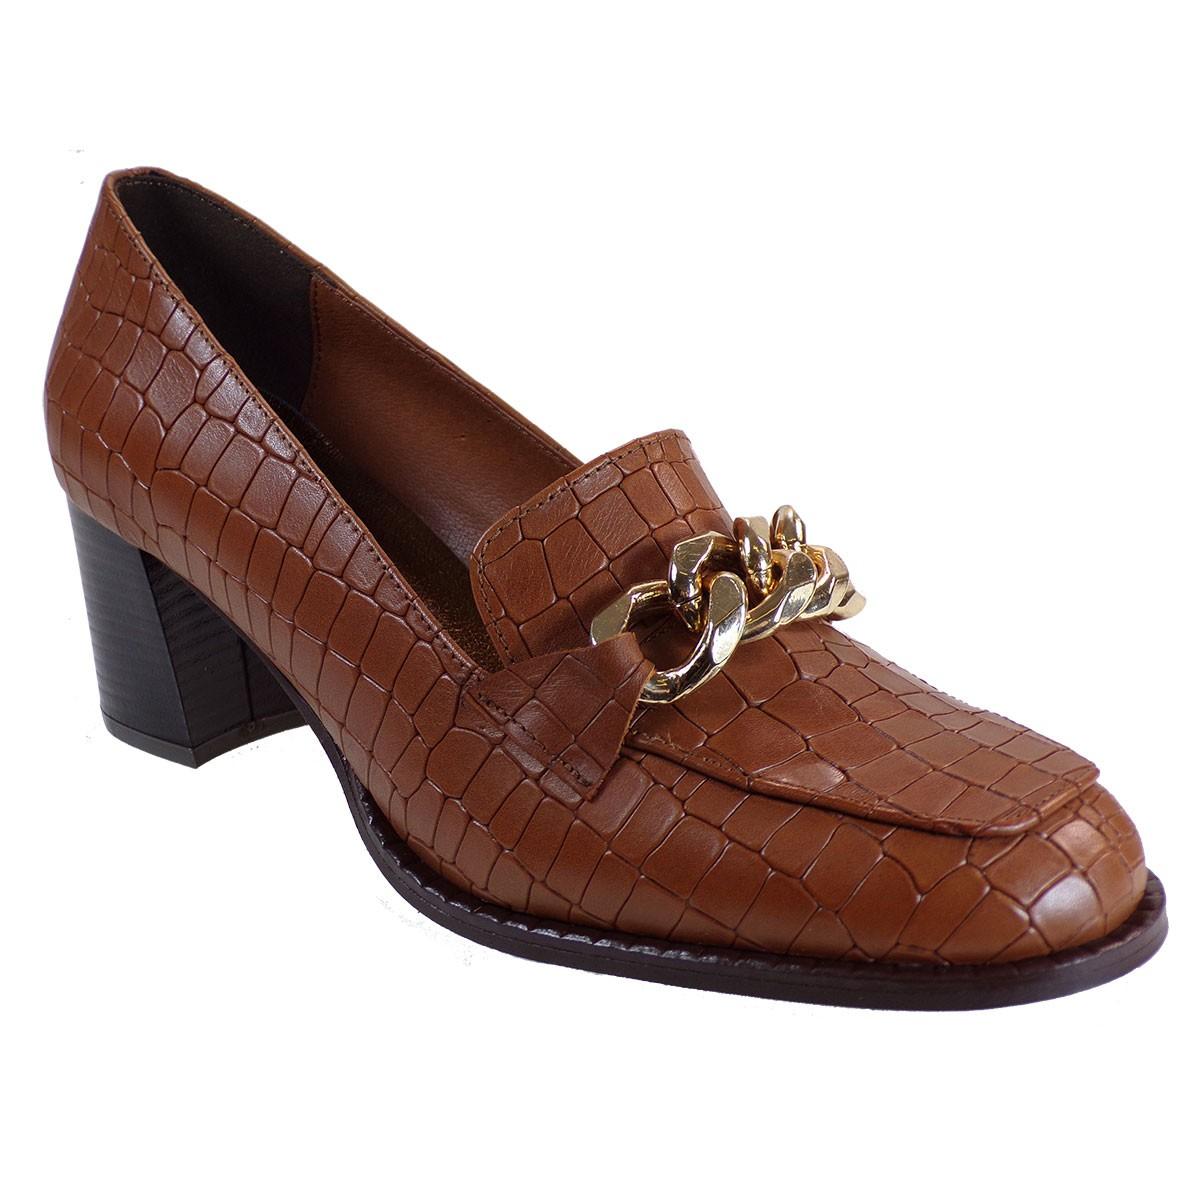 Katia Shoes Γυναικεία Παπούτσια Γόβες Κ33-1843 Ταμπά Κροκό